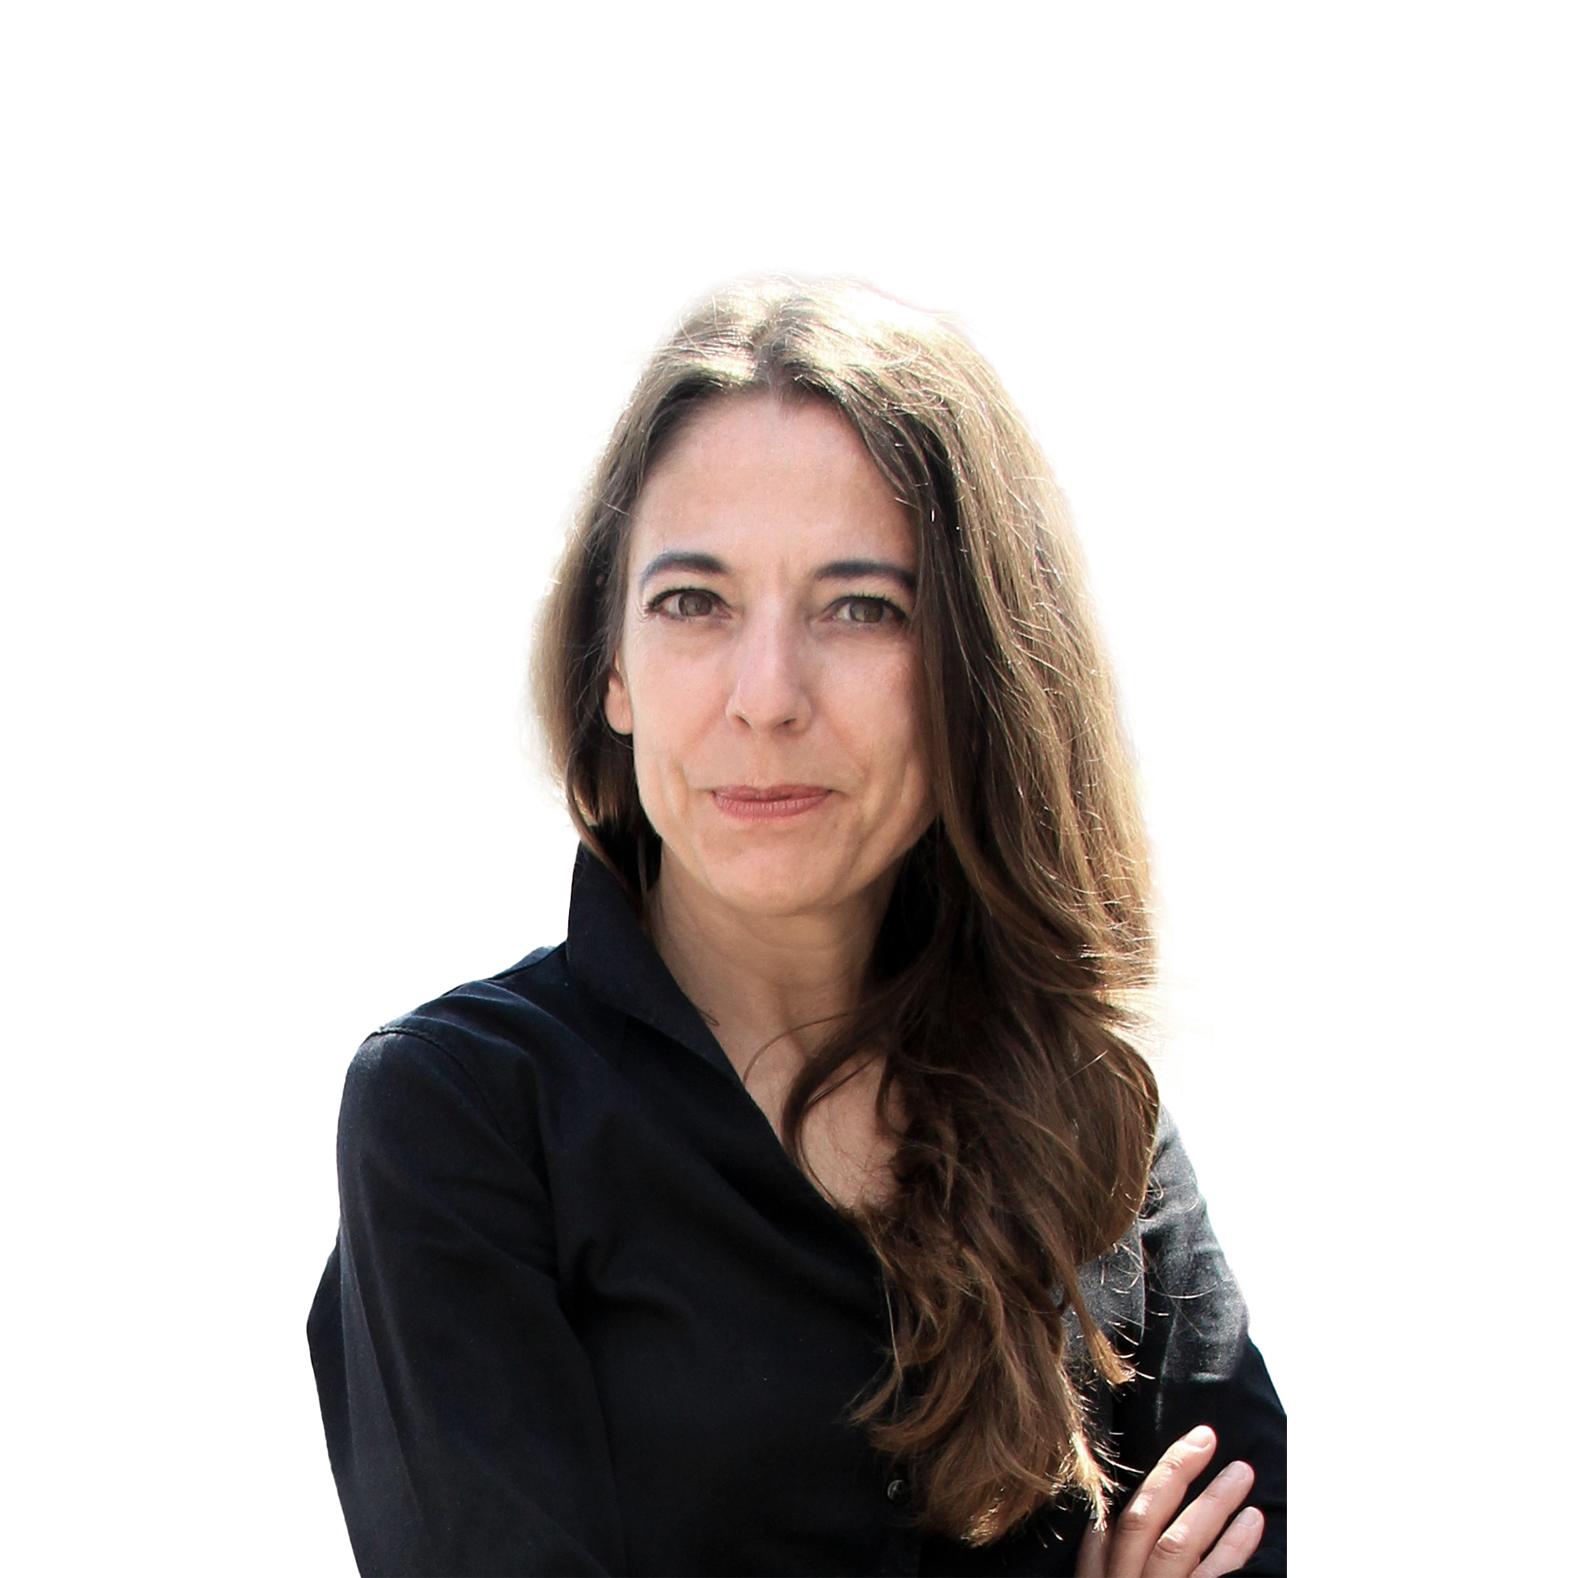 Manuela Fantini